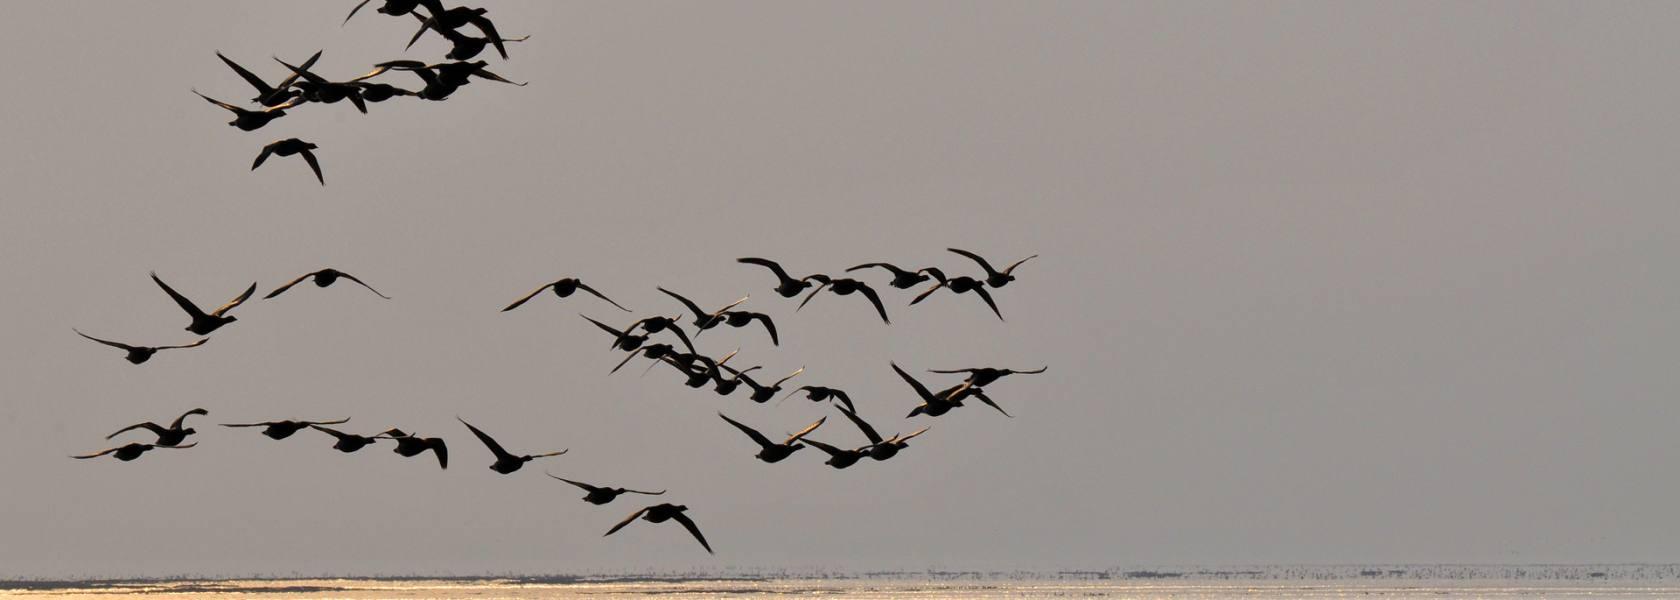 Zugvögel im Sonnenaufgang, © Beate Ulich